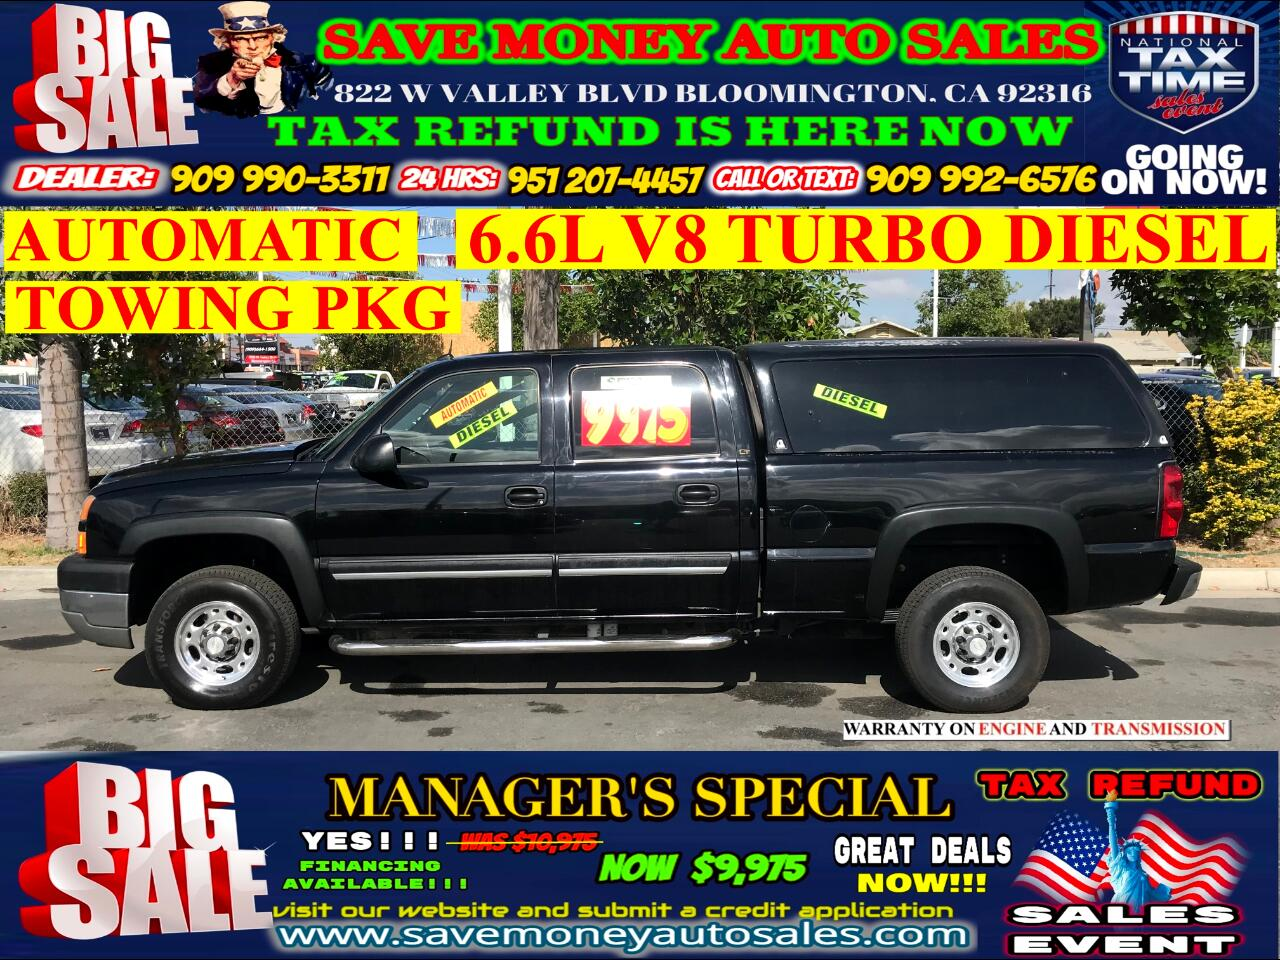 2005 Chevrolet Silverado 2500HD LT>6.6L V8 TURBO DIESEL> TOWING PKG>